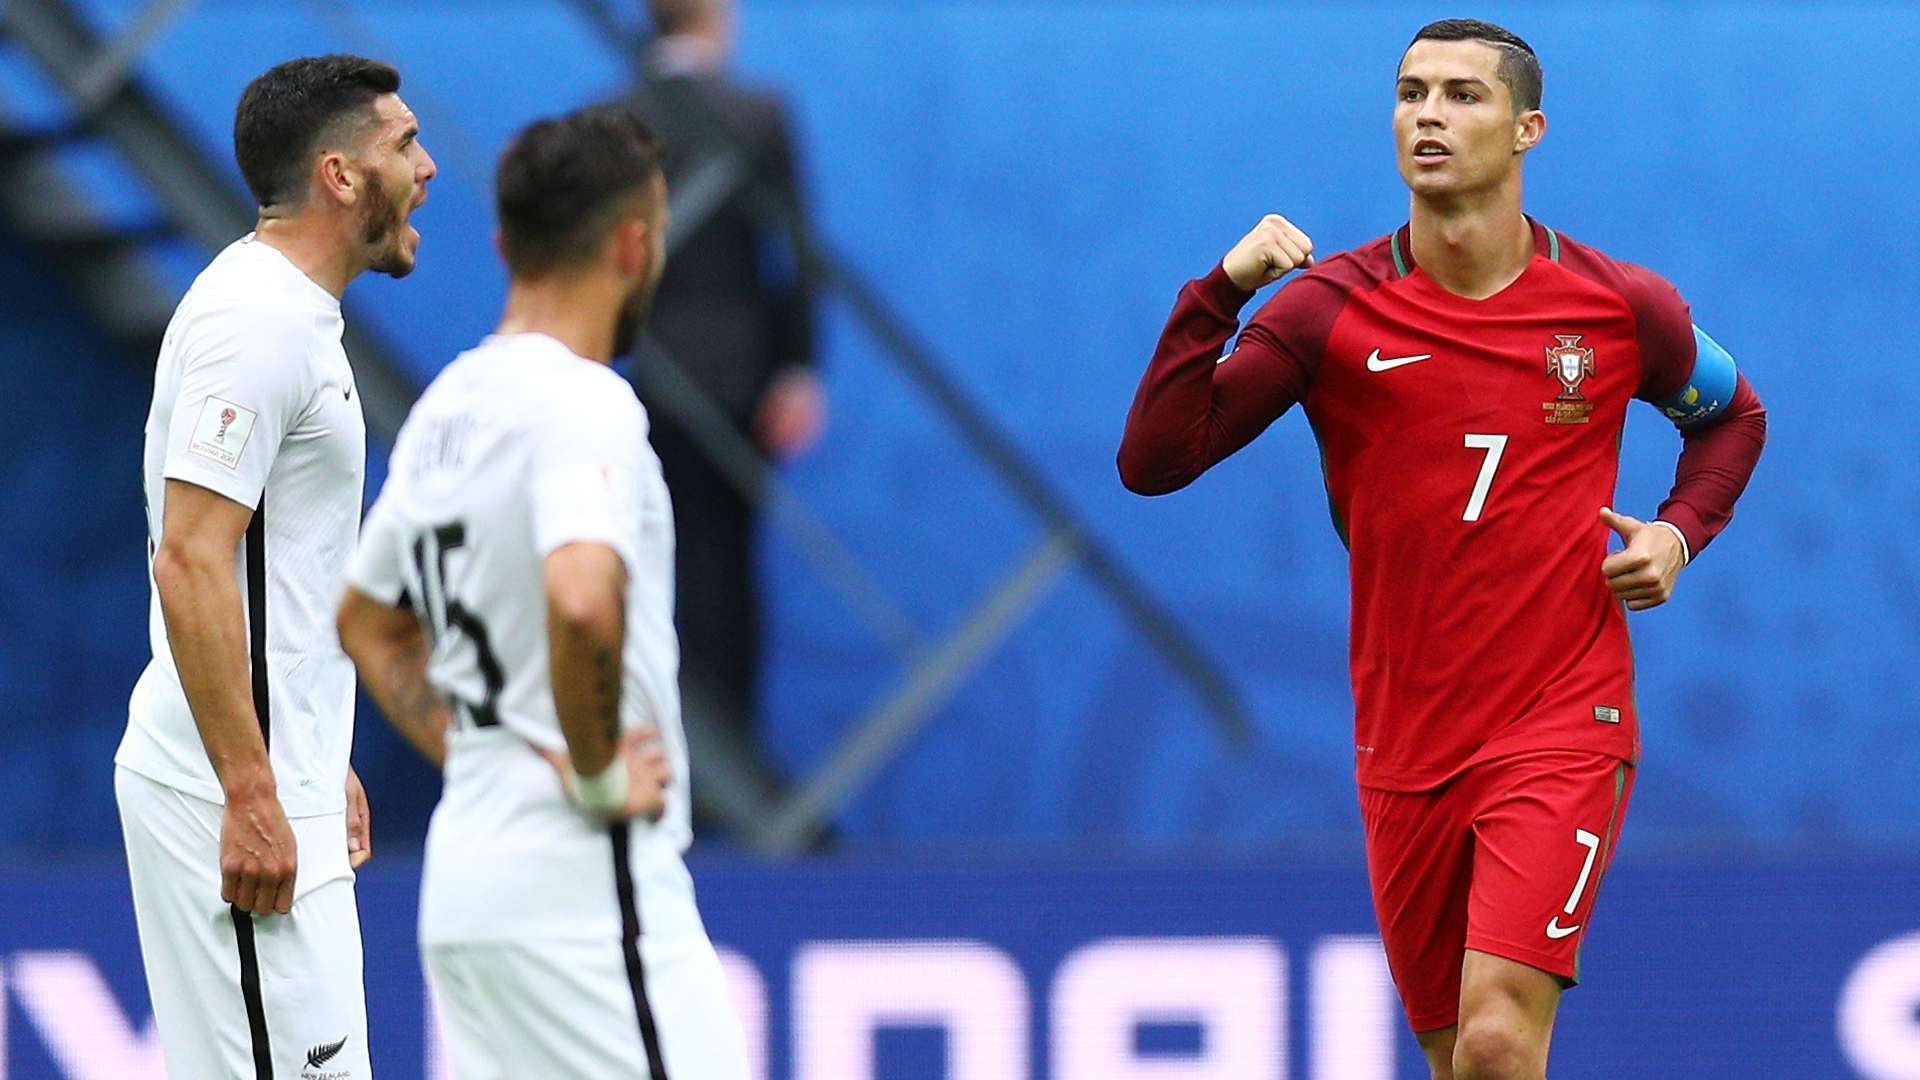 Portugal New Zealand Cristiano Ronaldo Confederations Cup